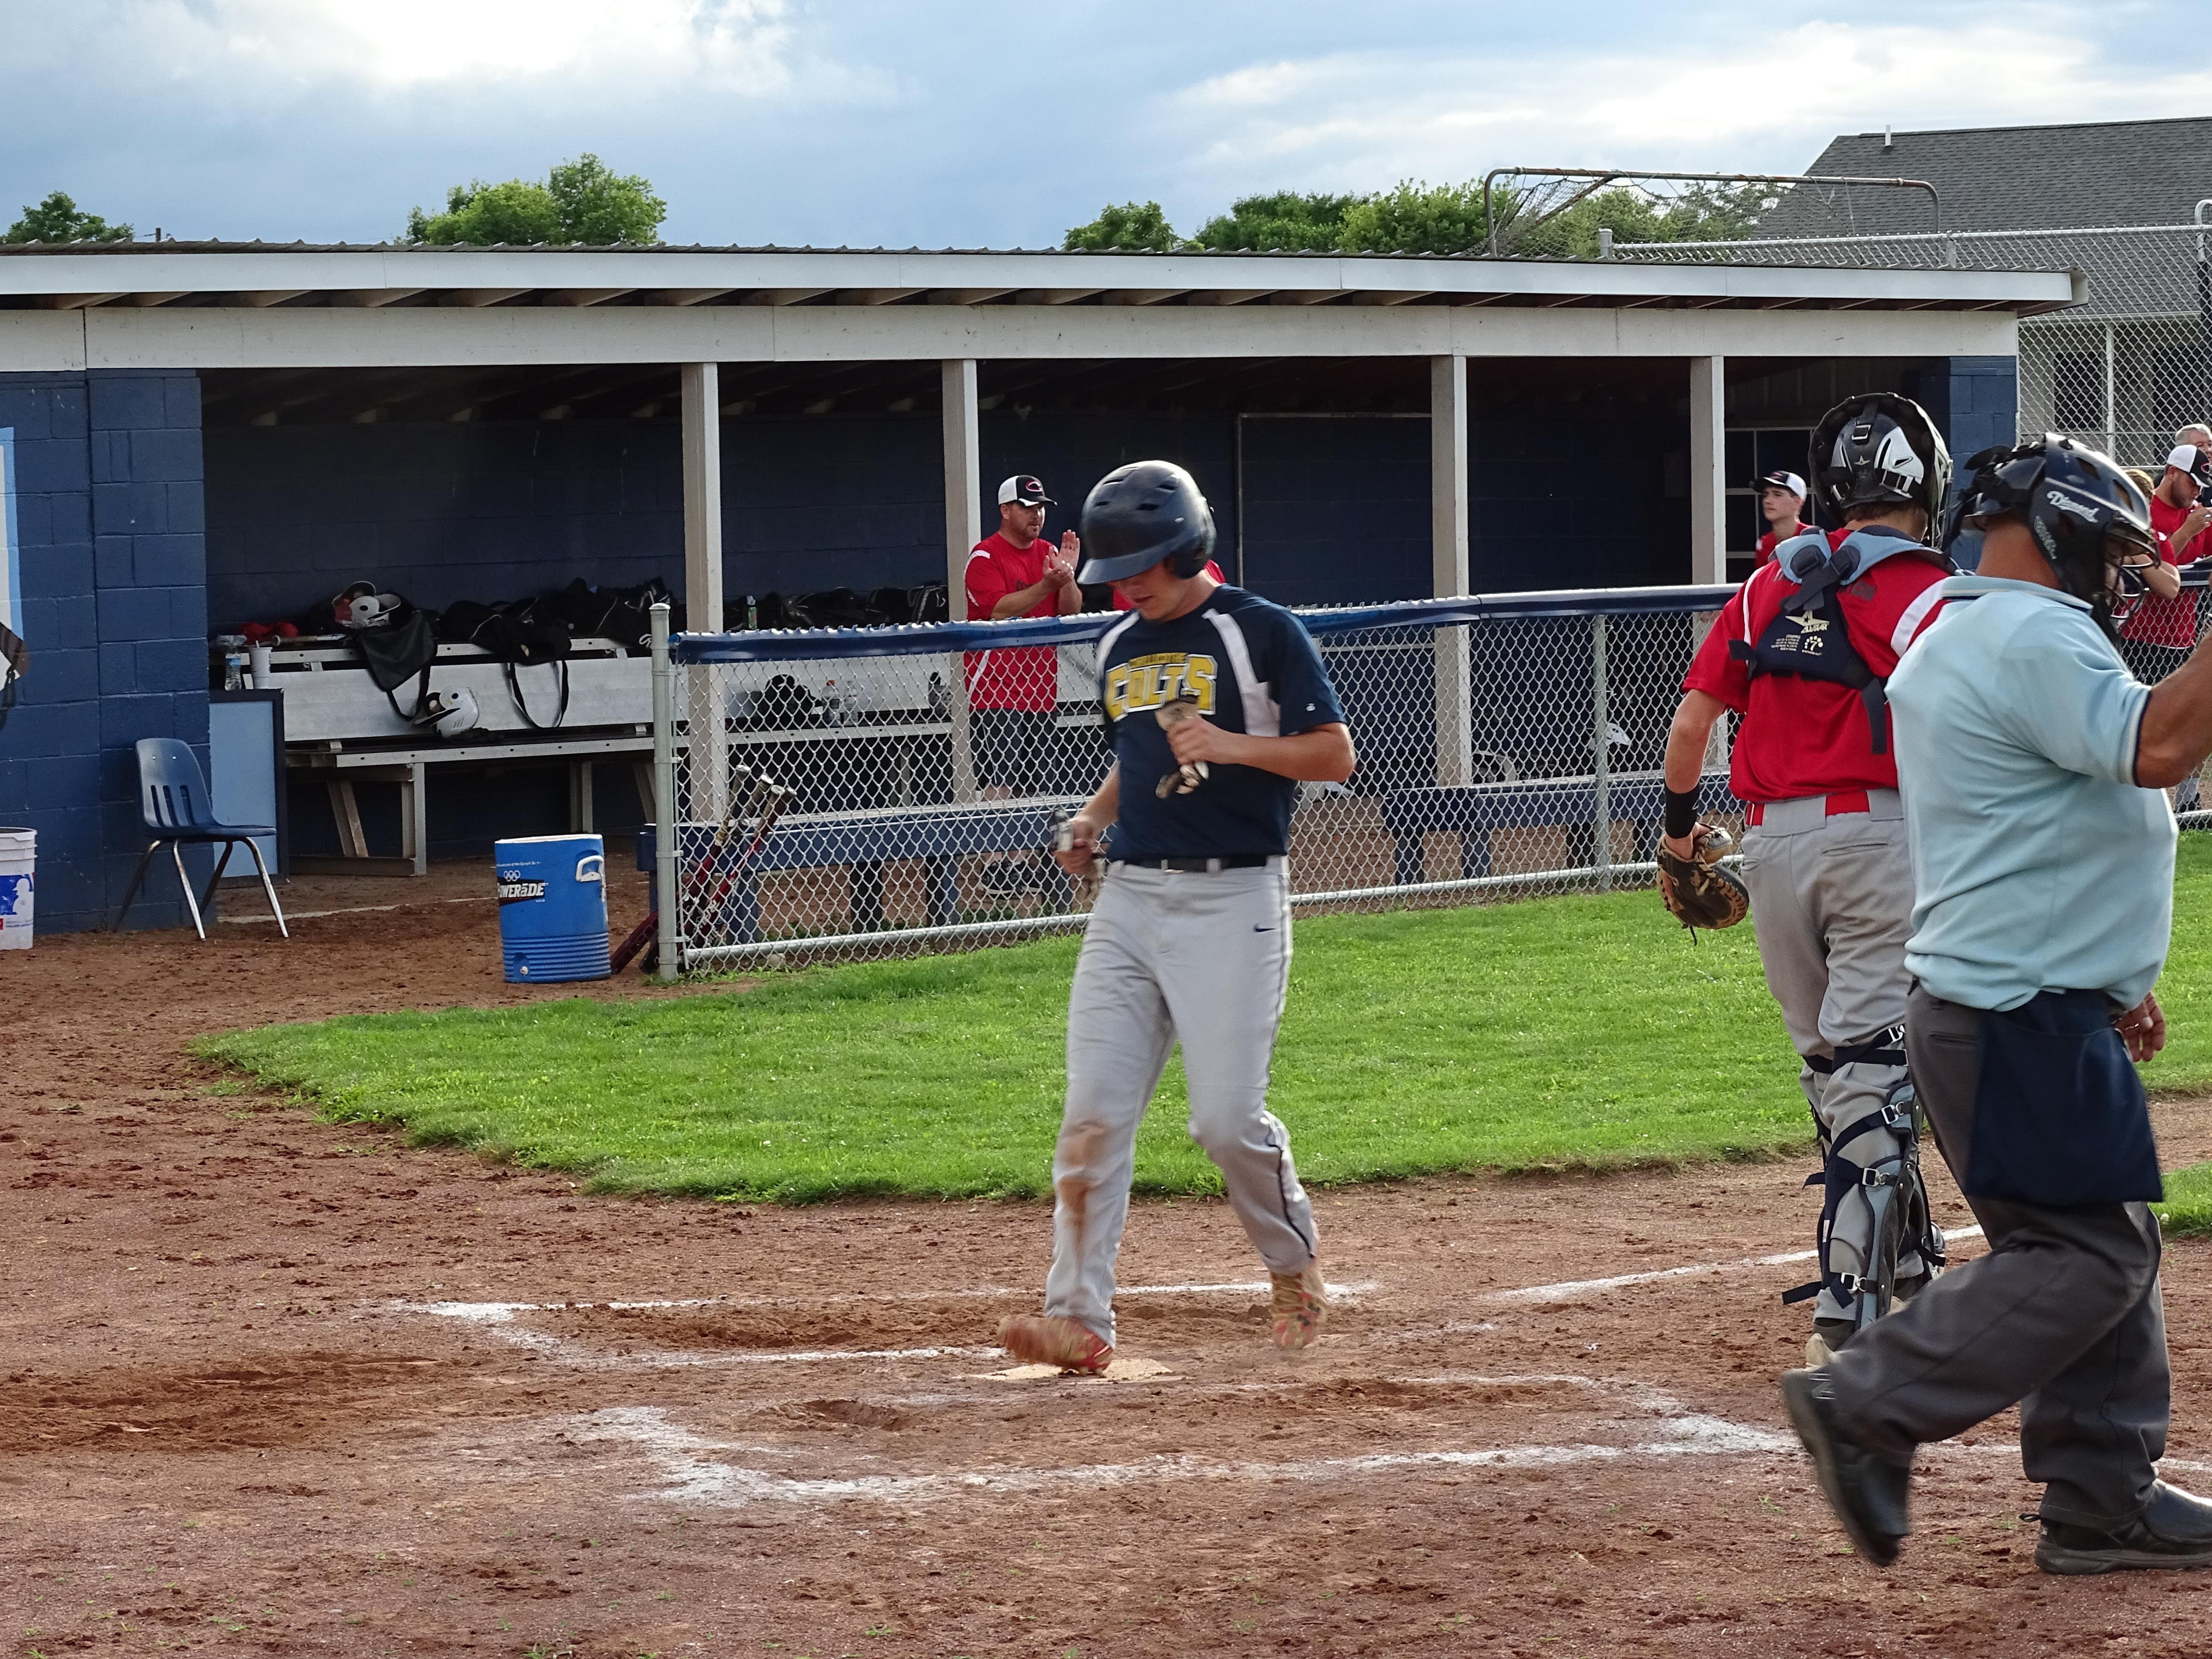 Post 757's Zack Jordan crosses home plate, Thursday, against the Chillicothe Cobras at Adena High School.